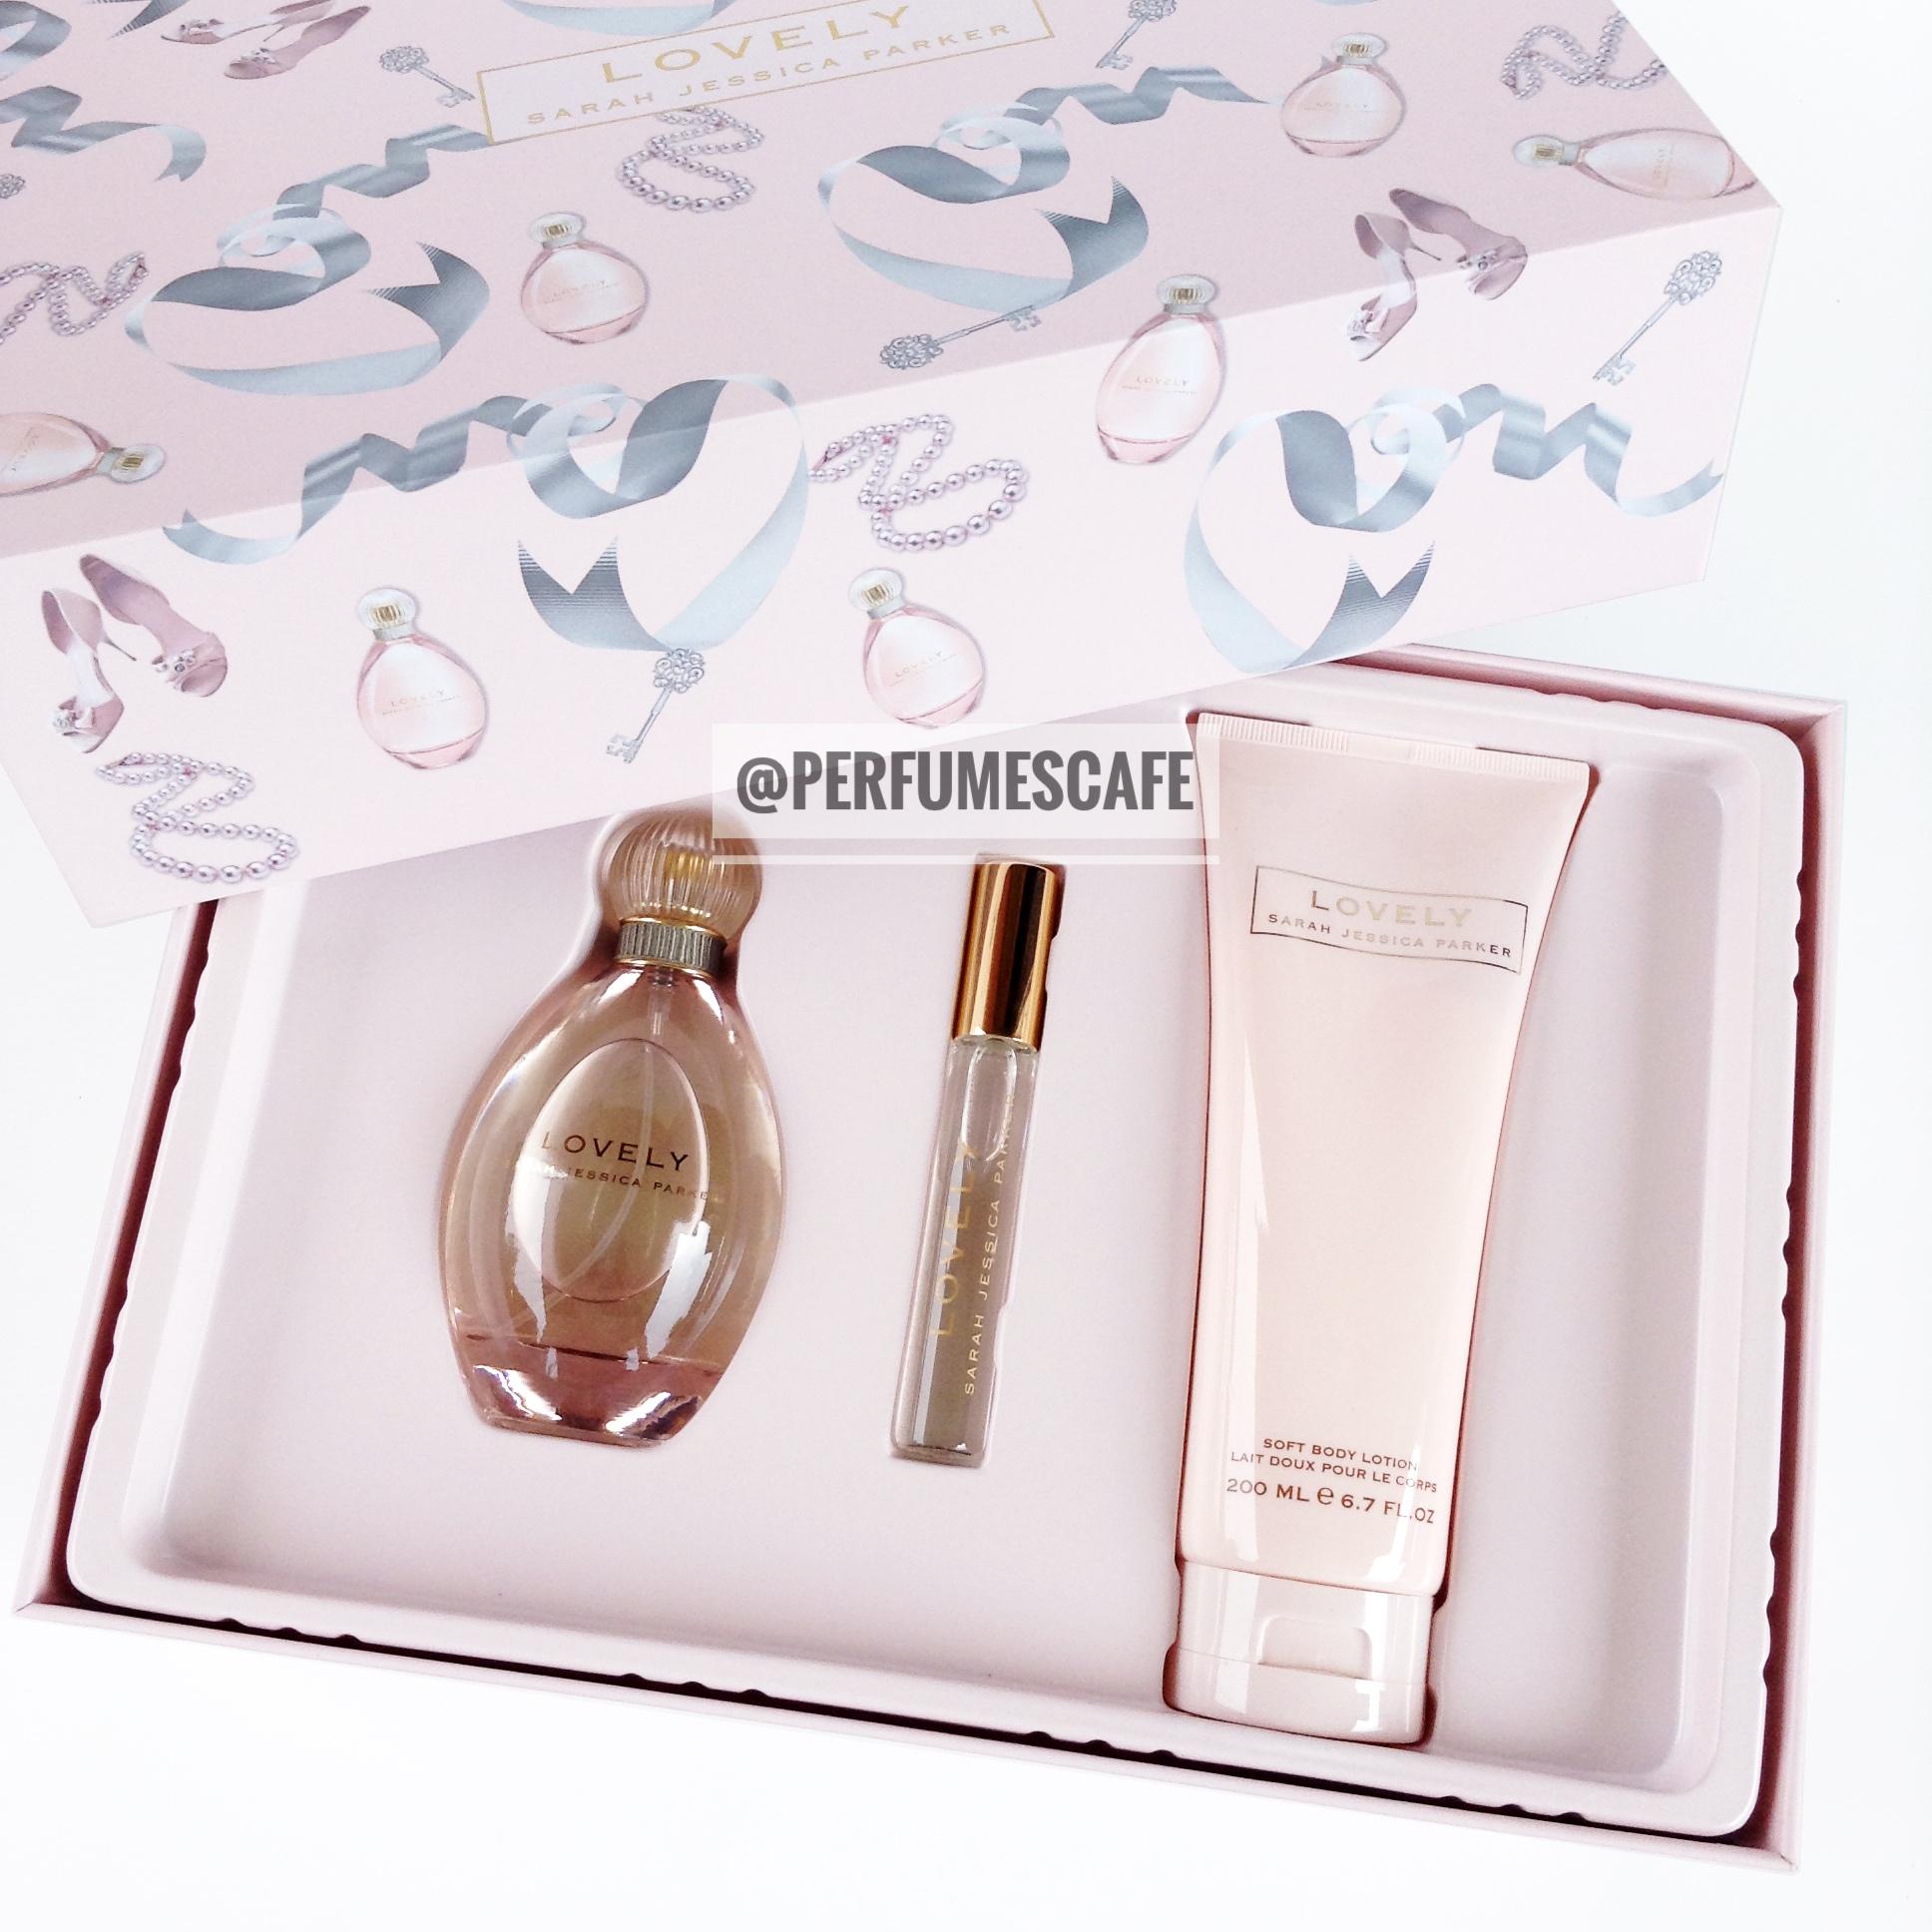 Sarah Jessica Parker Lovely Gift Set Perfume 100ml + Body Lotion 200ml + Perfume 10ml